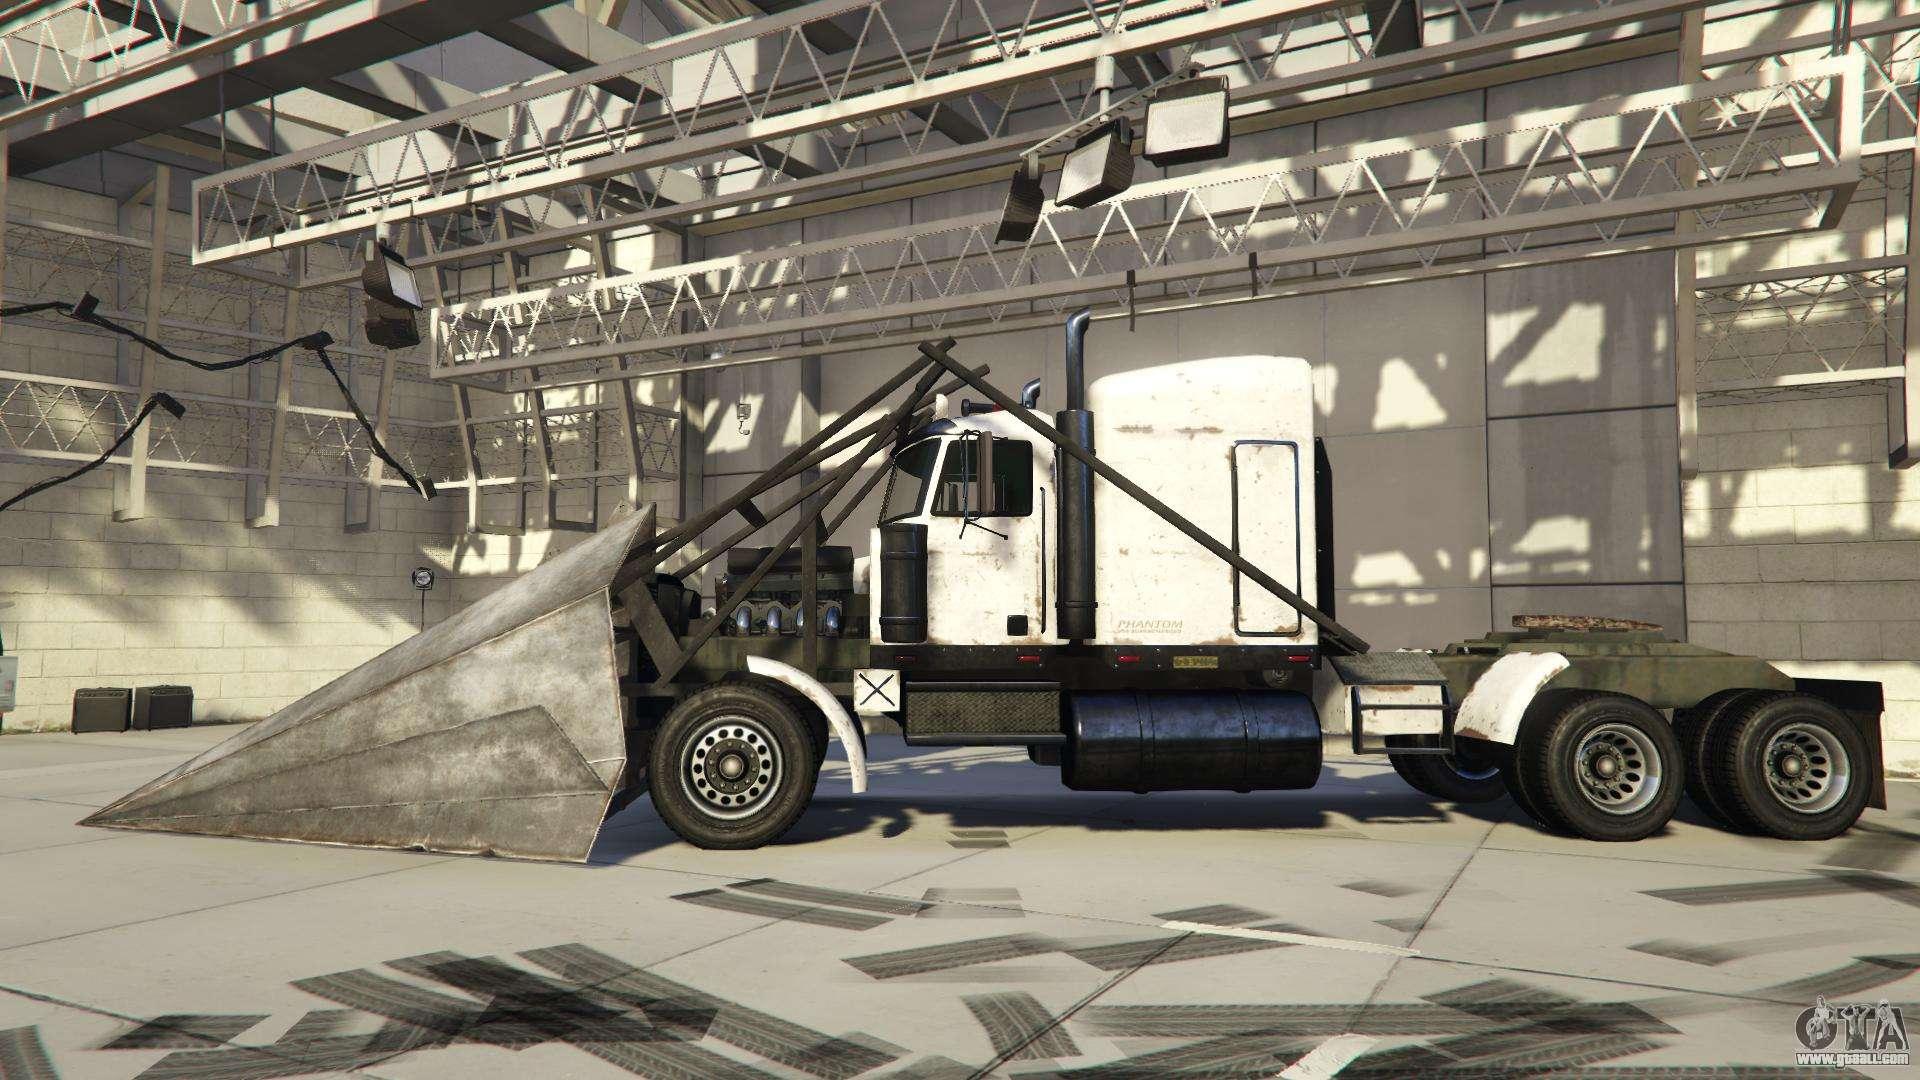 Gta online wastelander uses   GTA 5 Online: Import Export